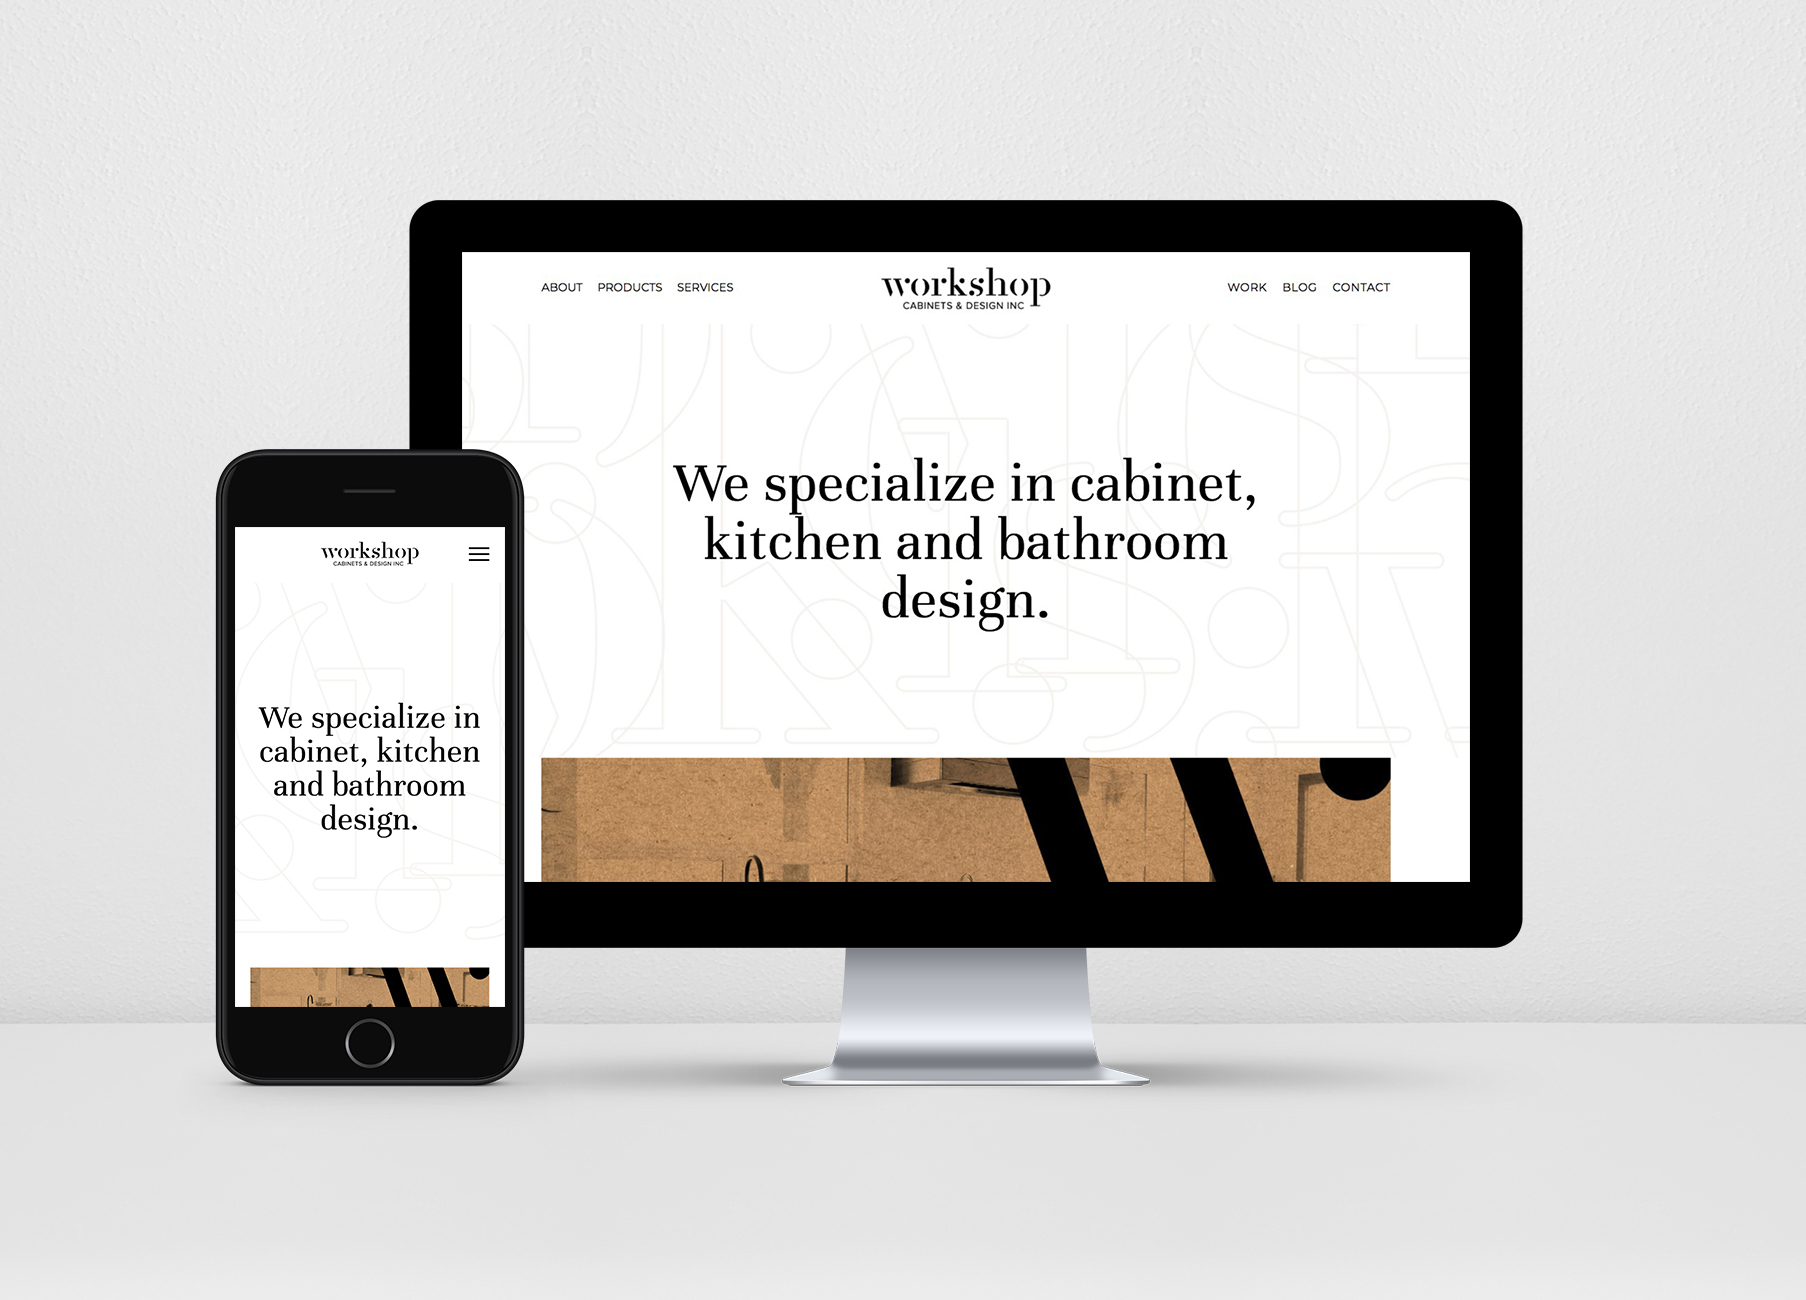 Natasia Designs Edmonton Graphic Designer, Website Designer, Logo Designer and Branding | Workshop Cabinets and Design Alberta Canada Builder Maker Web Business Cards Visual Identity